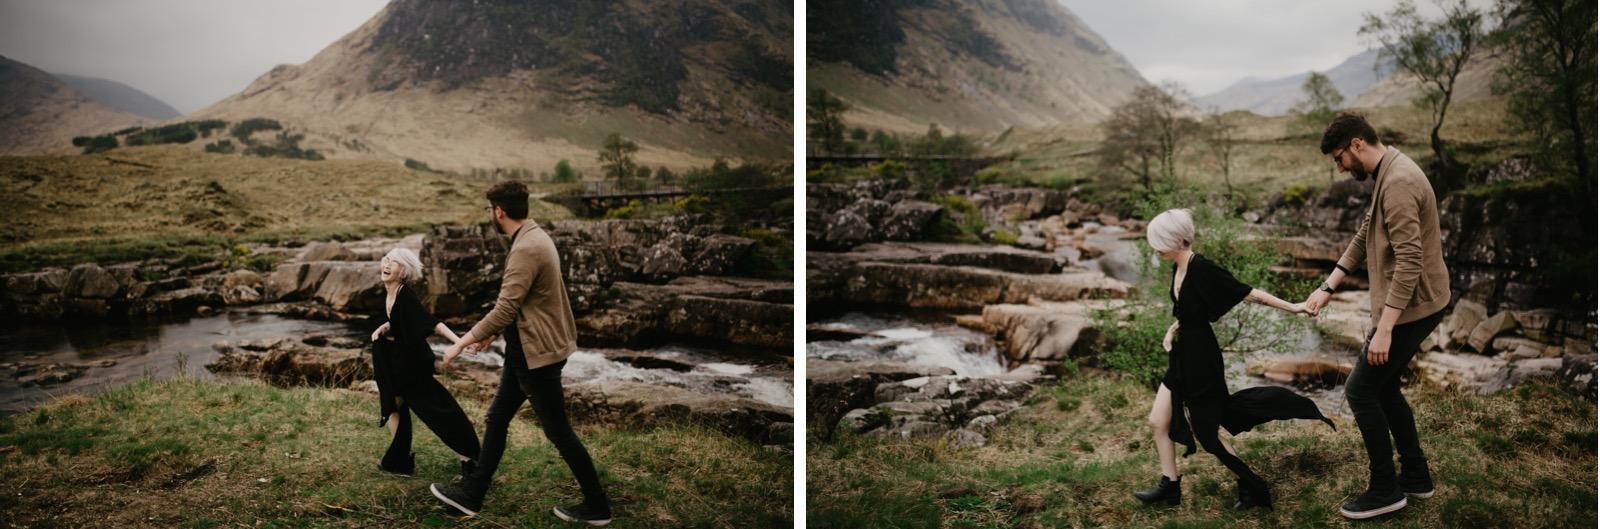 12_TamarHopePhotography-45_TamarHopePhotography-43.jpg